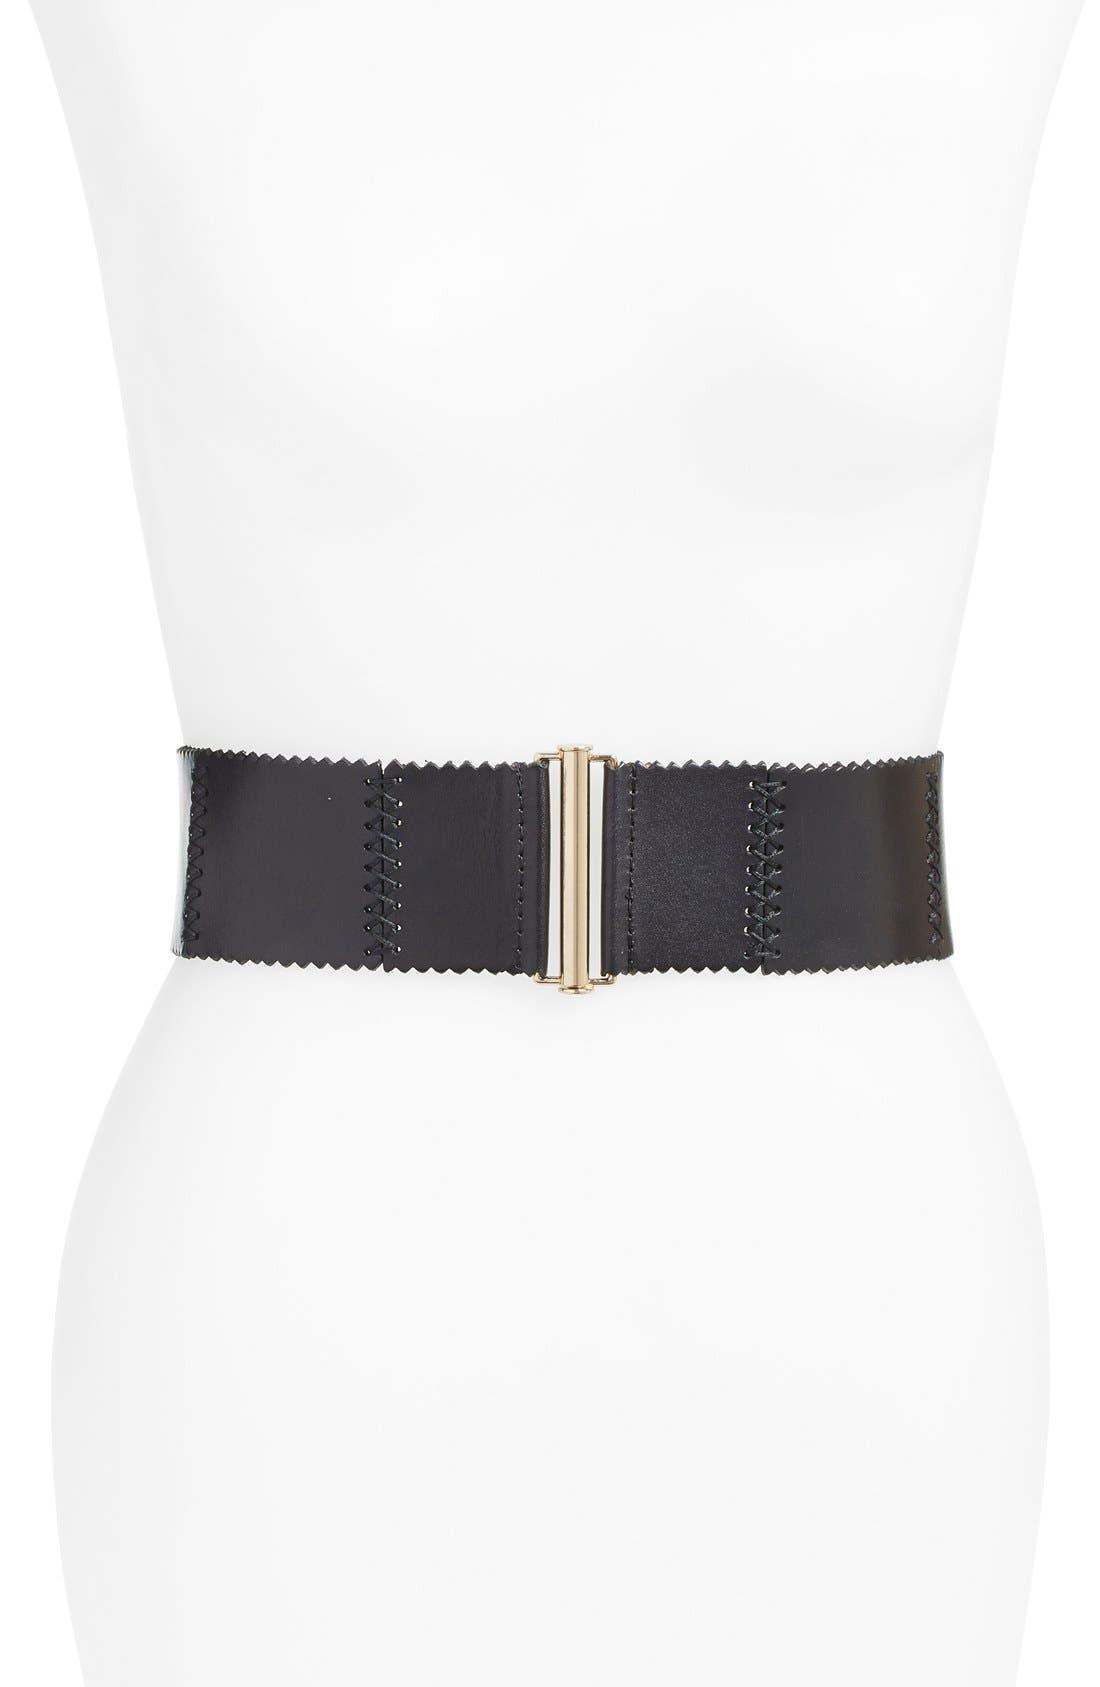 ELISE M. 'Woodland' Stitched Leather Belt in Black